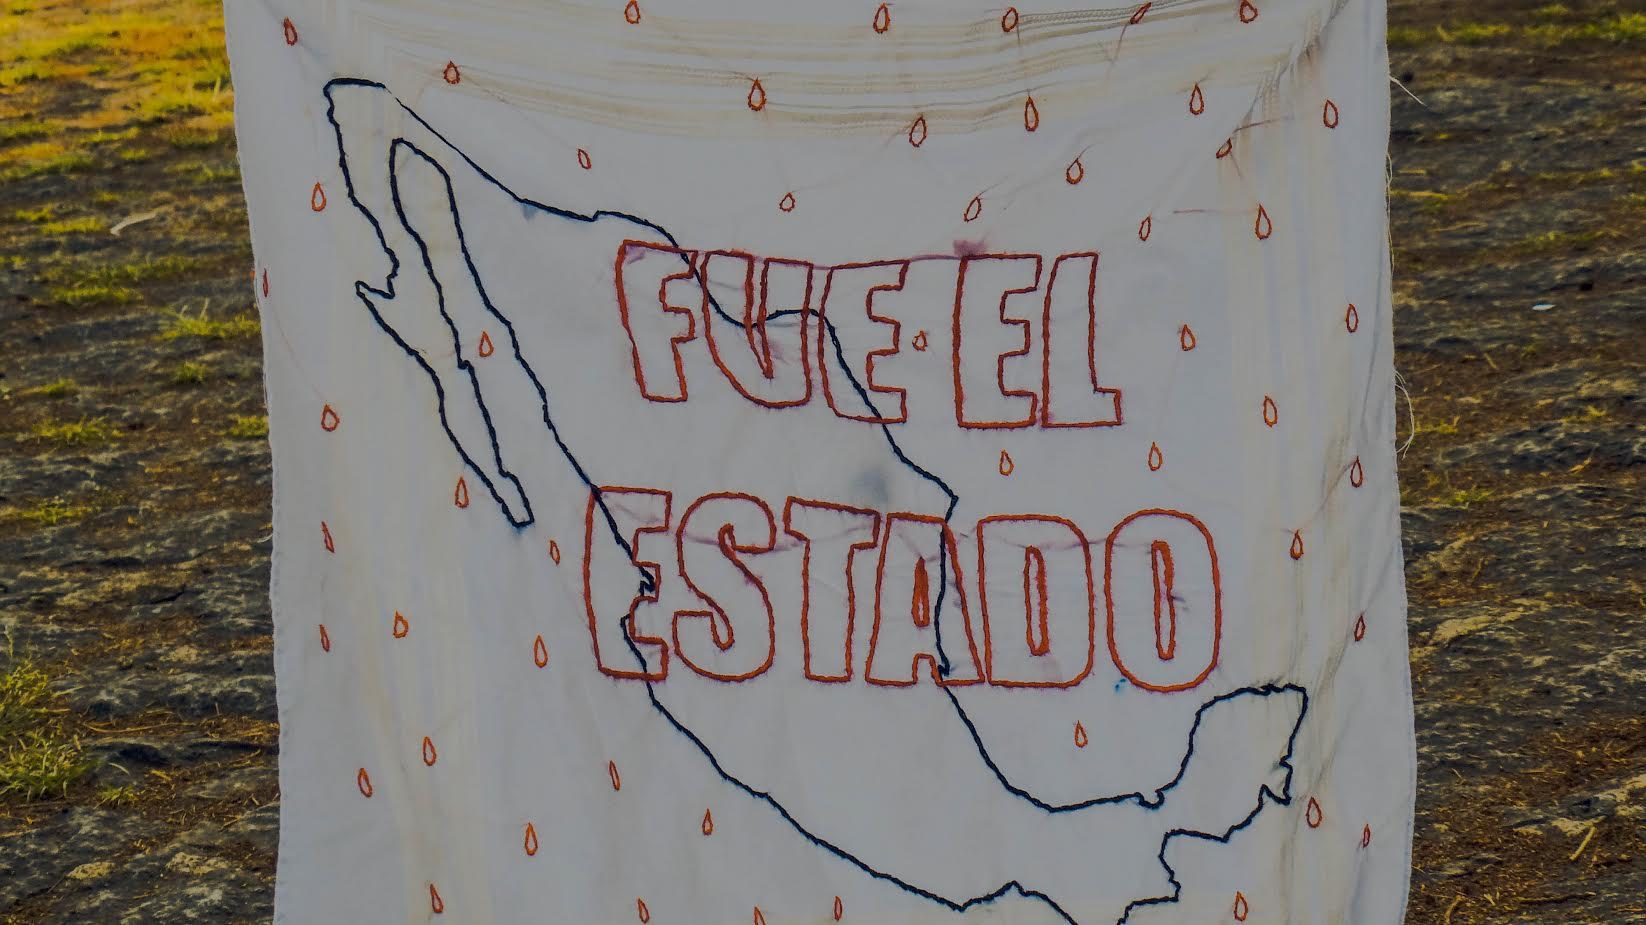 2016-08-27-1472302853-2075265-mexico.jpg